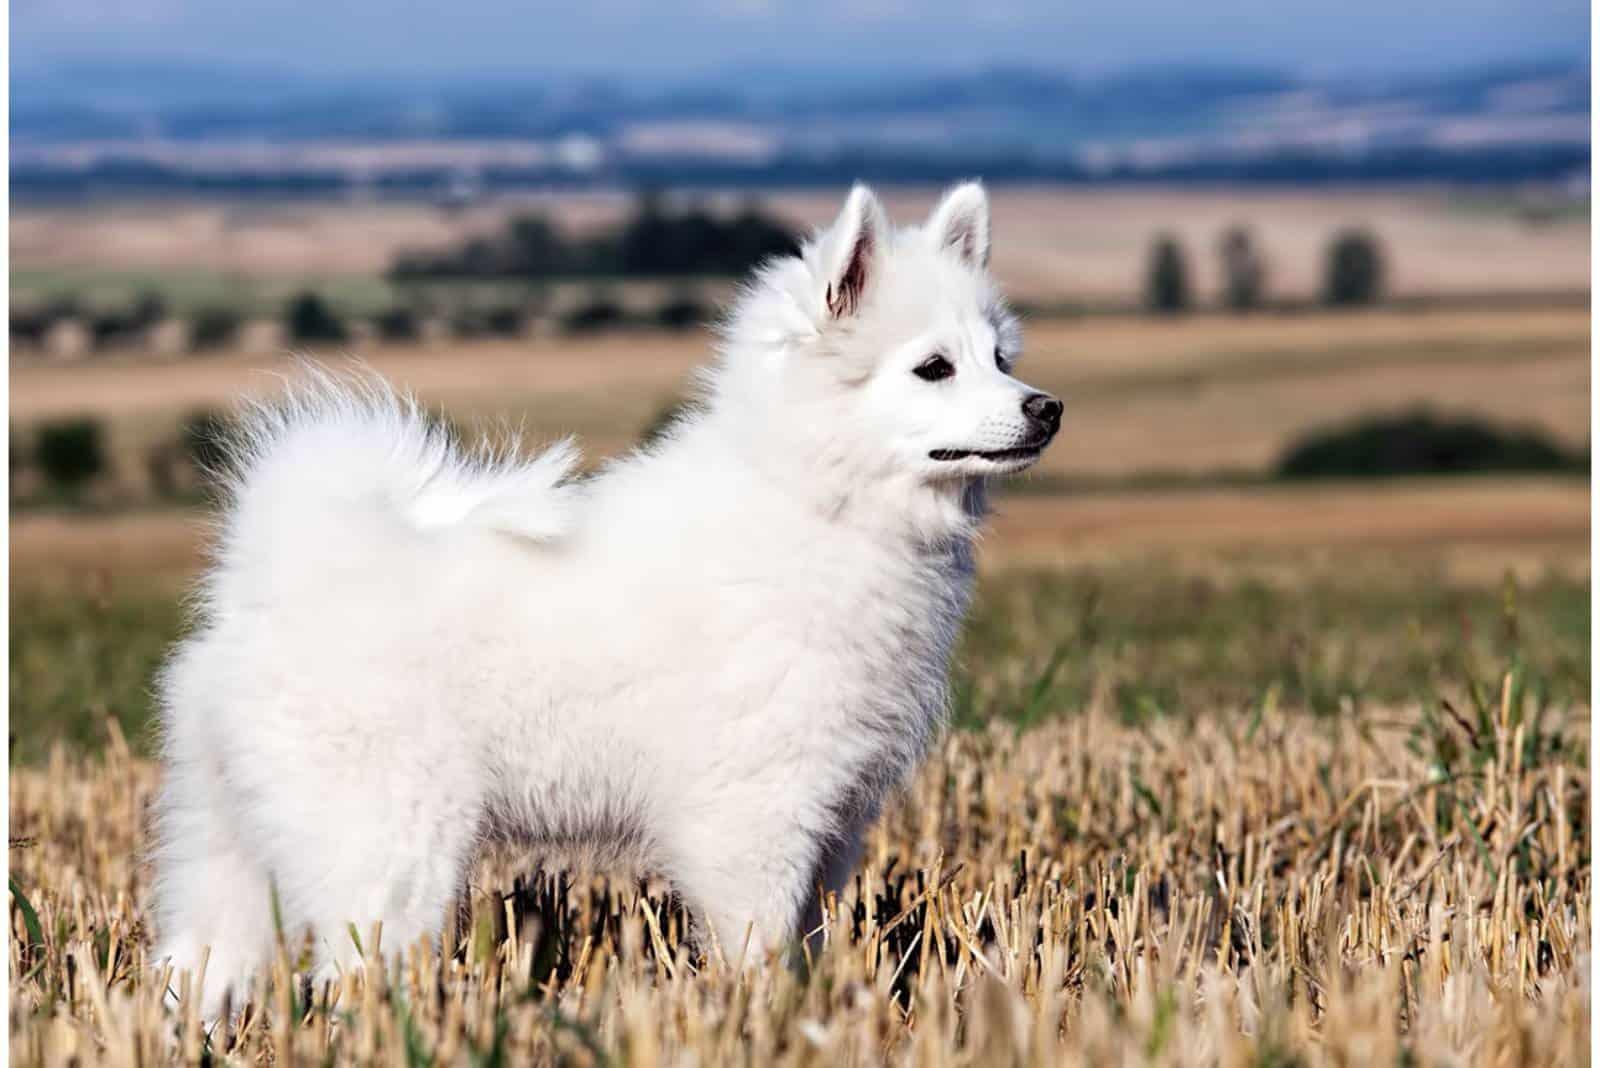 Gross Spitz pommerscher Hund